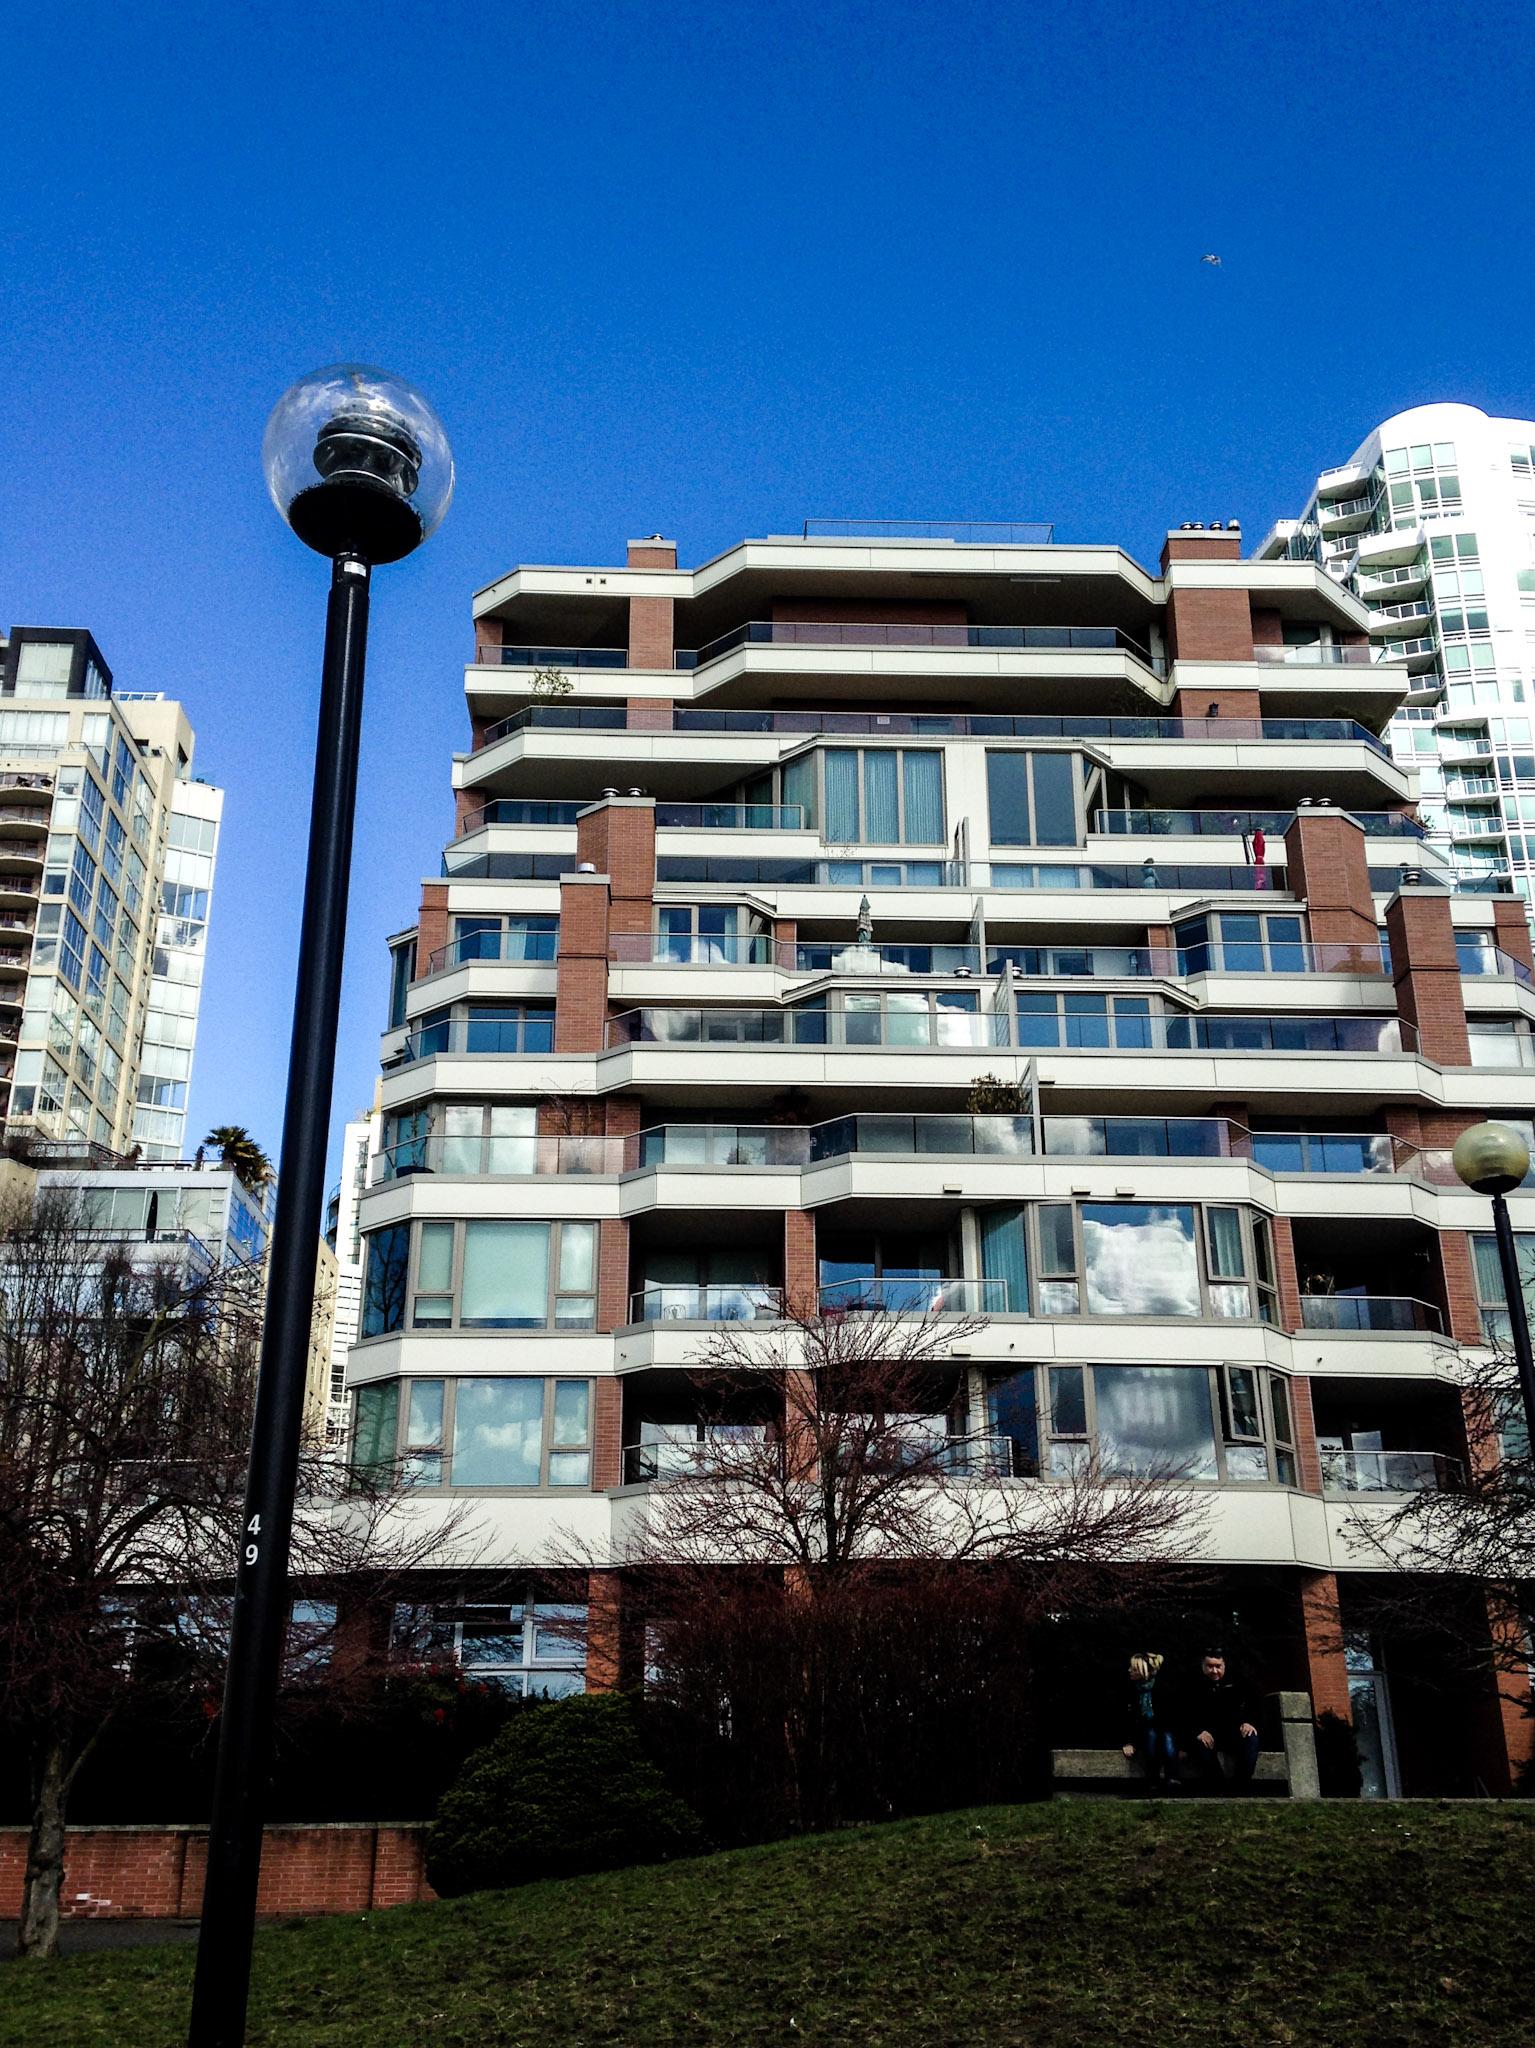 Apartment Along The Seawall